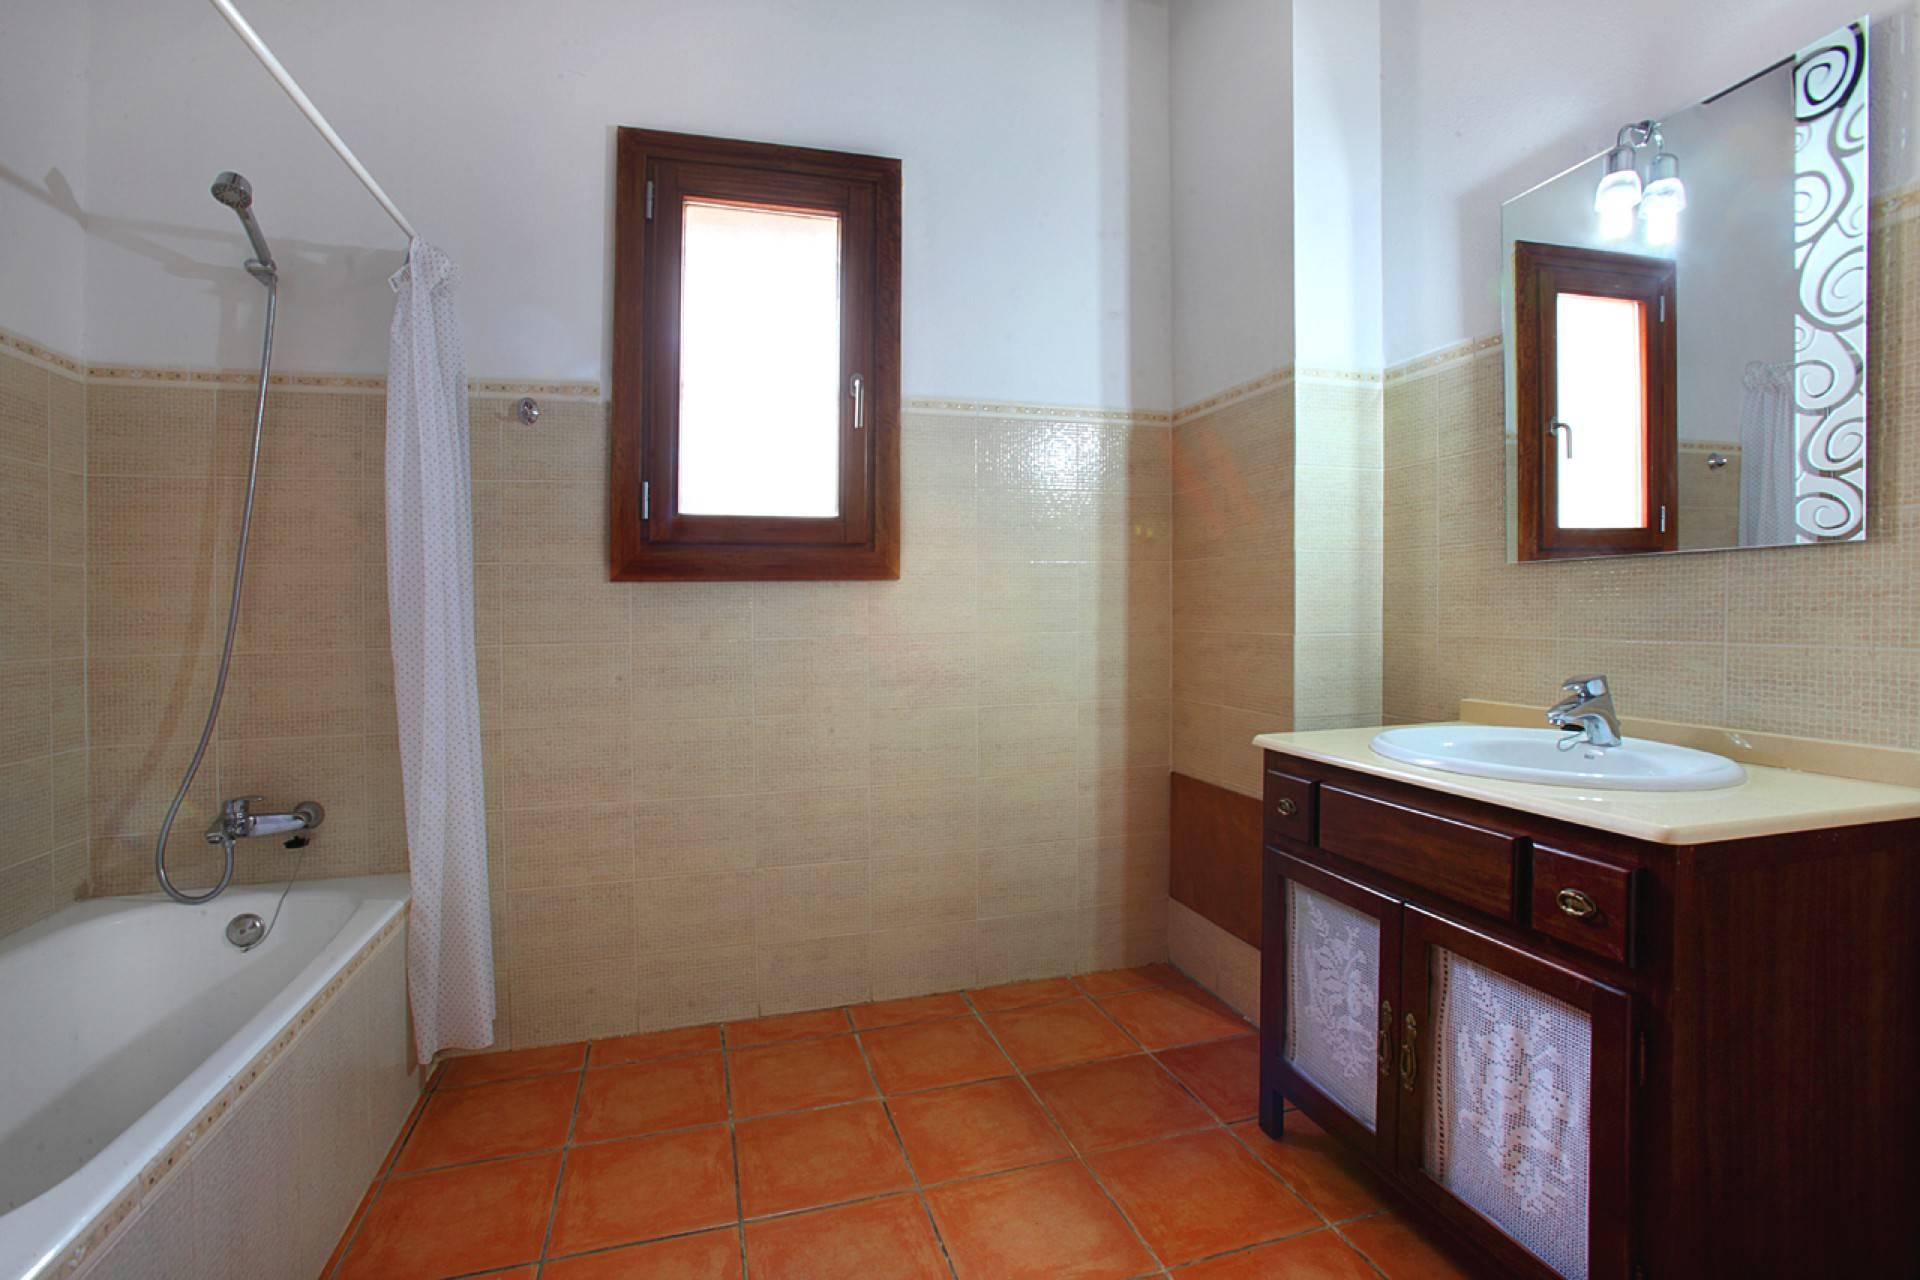 01-142 Rustic farmhouse Mallorca east Bild 13